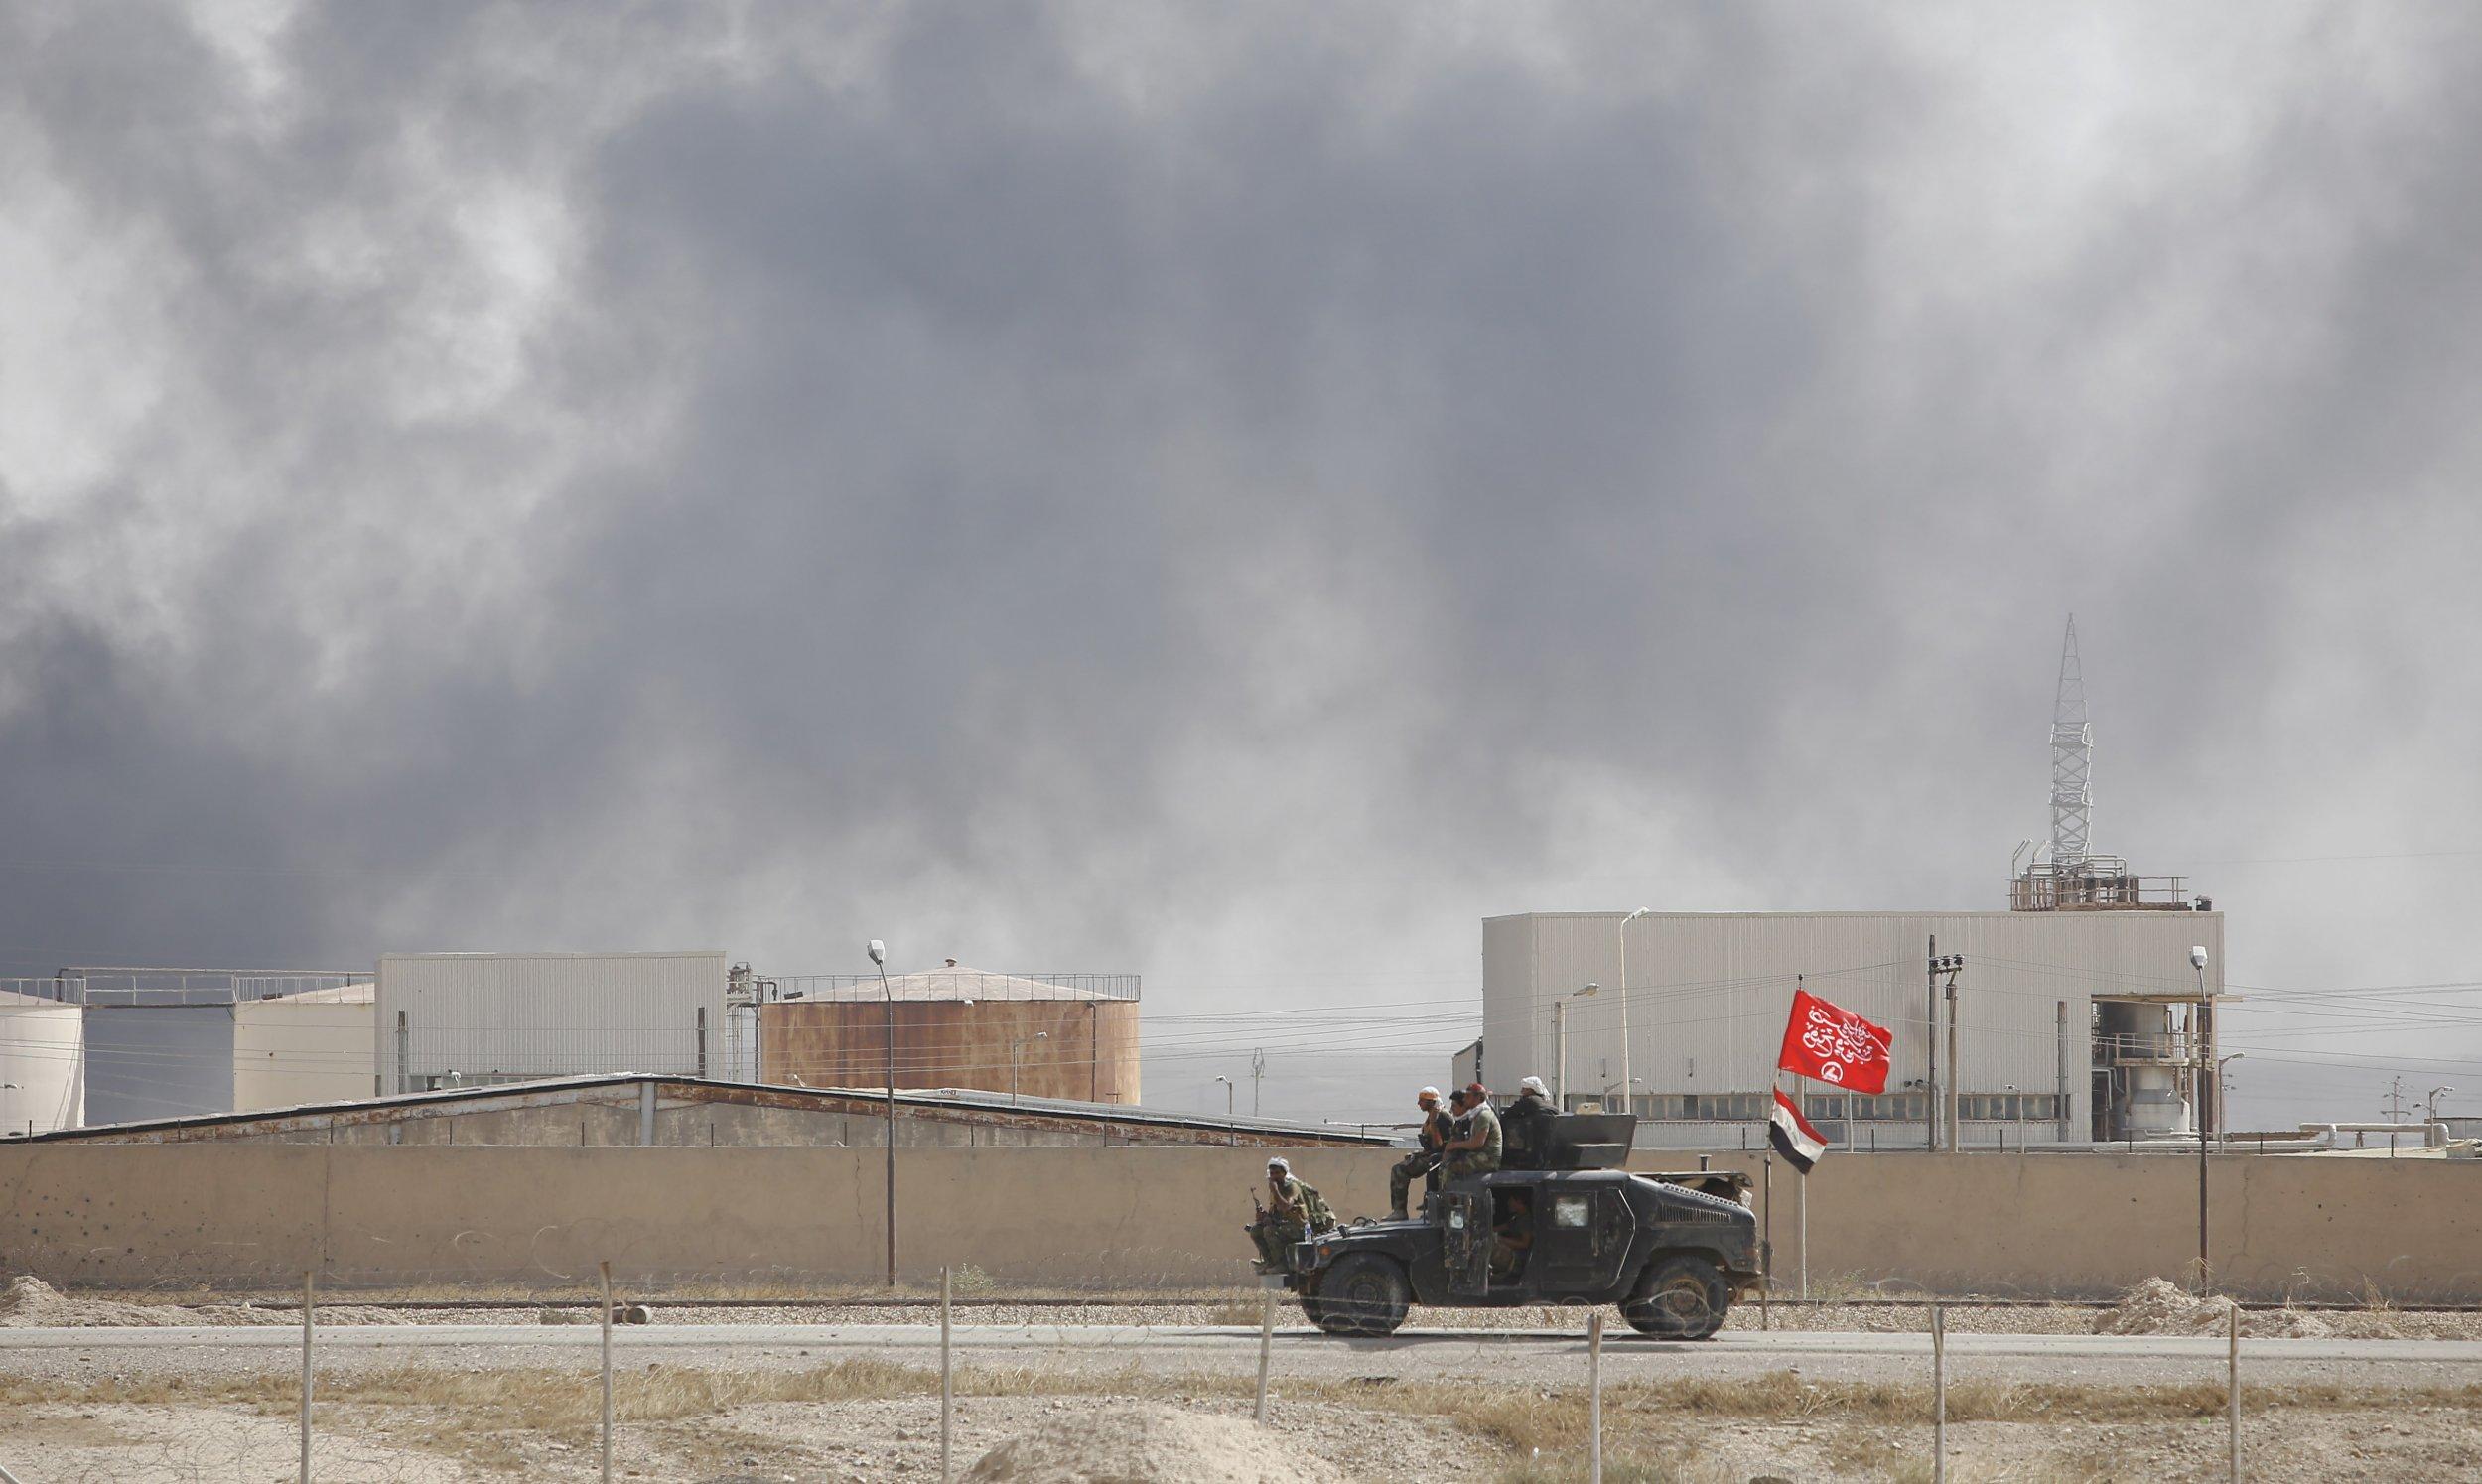 Iraqi fighters drive past oil refinery.